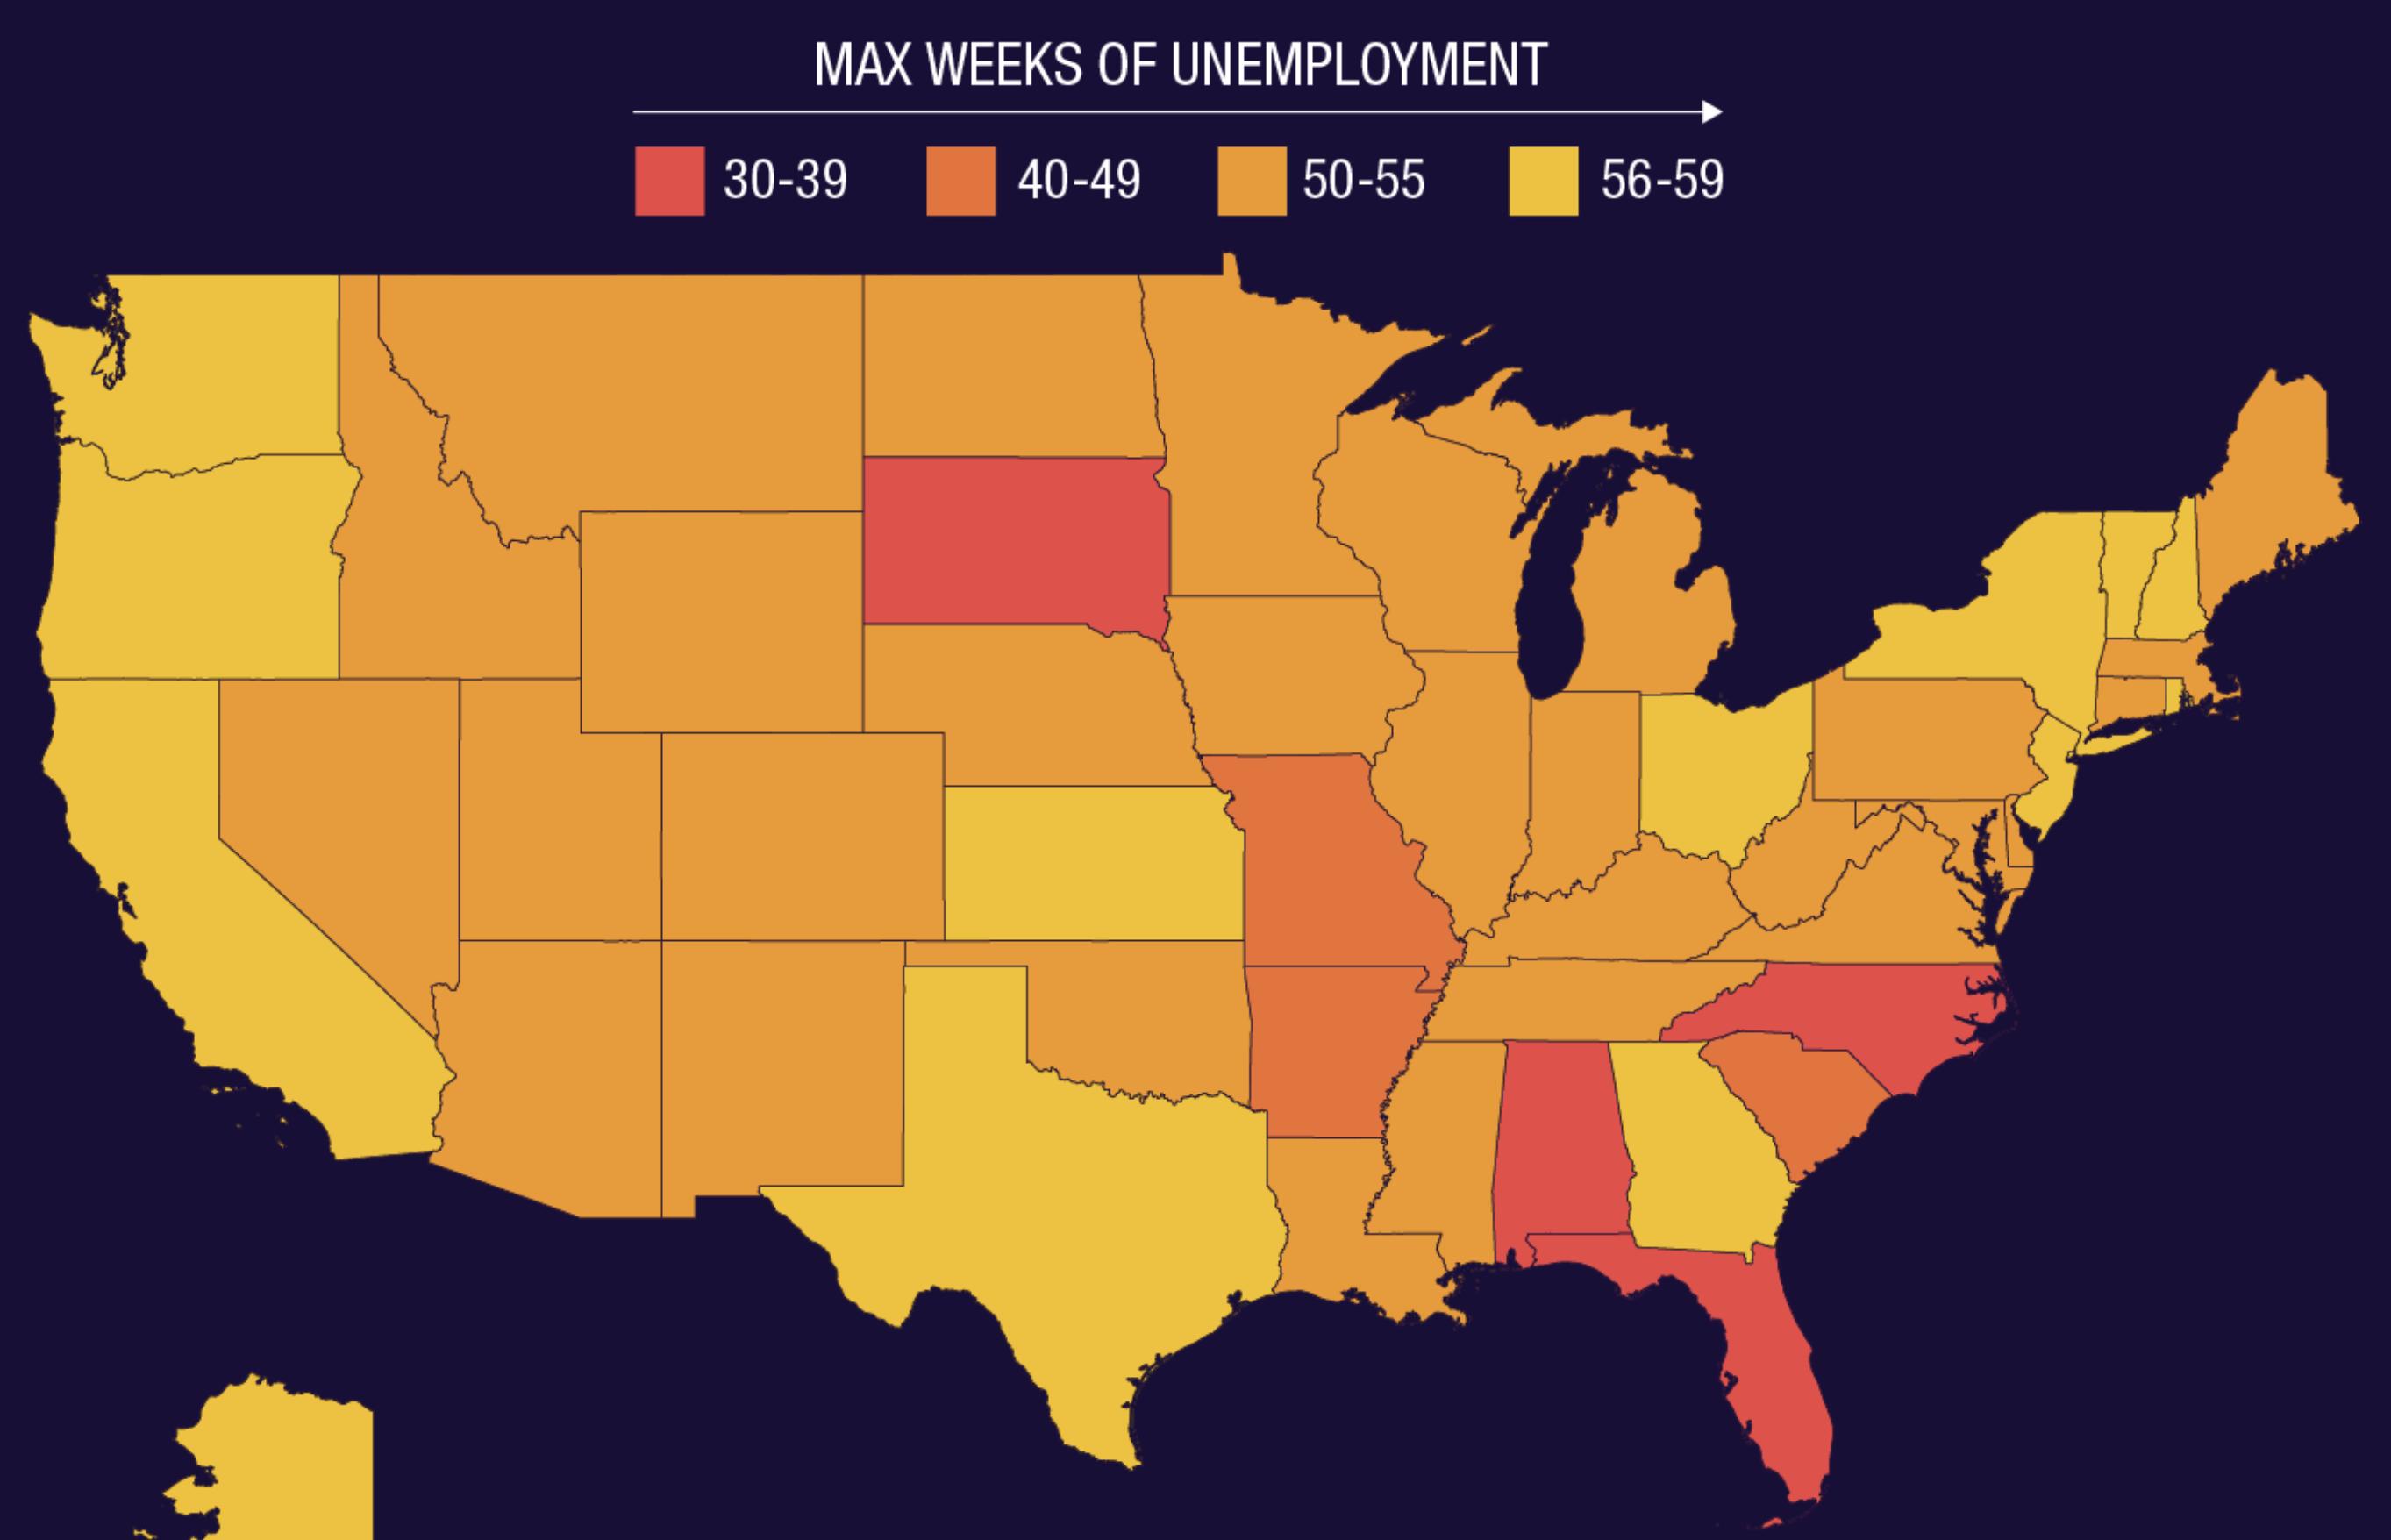 Coronavirus stimulus: States extend unemployment benefits as Congress debates extension